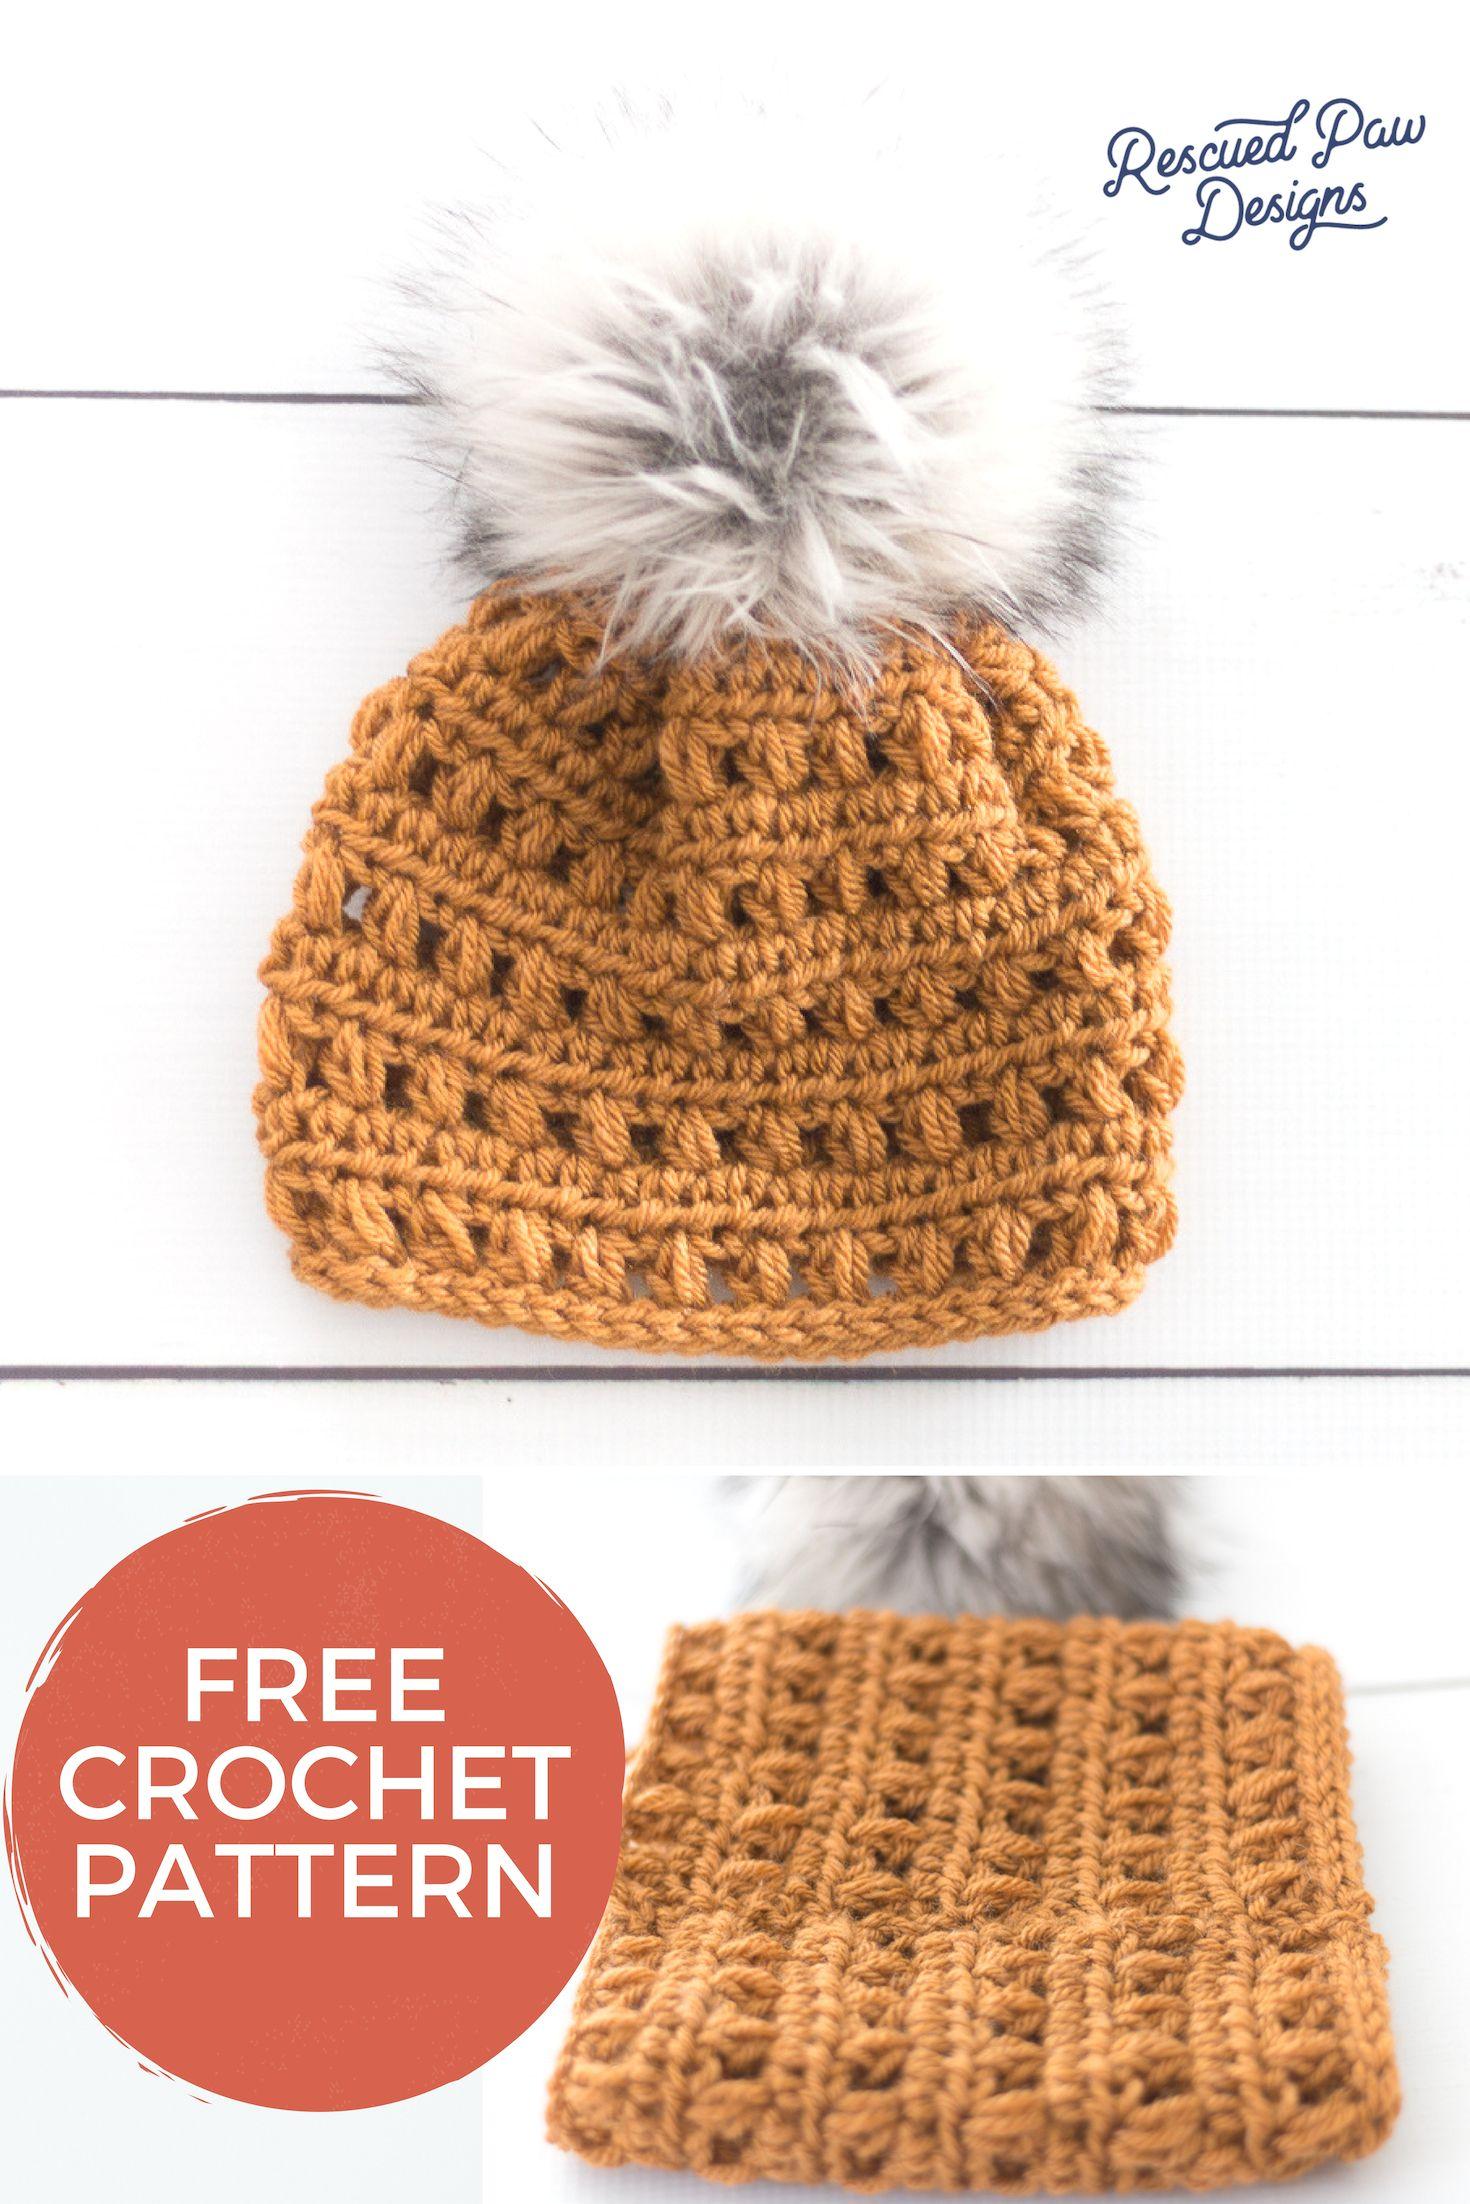 7f765c4066f Fur Pom Hat to Crochet - Free Crochet Pattern from Rescued Paw Designs +  Crochet Pom Hat